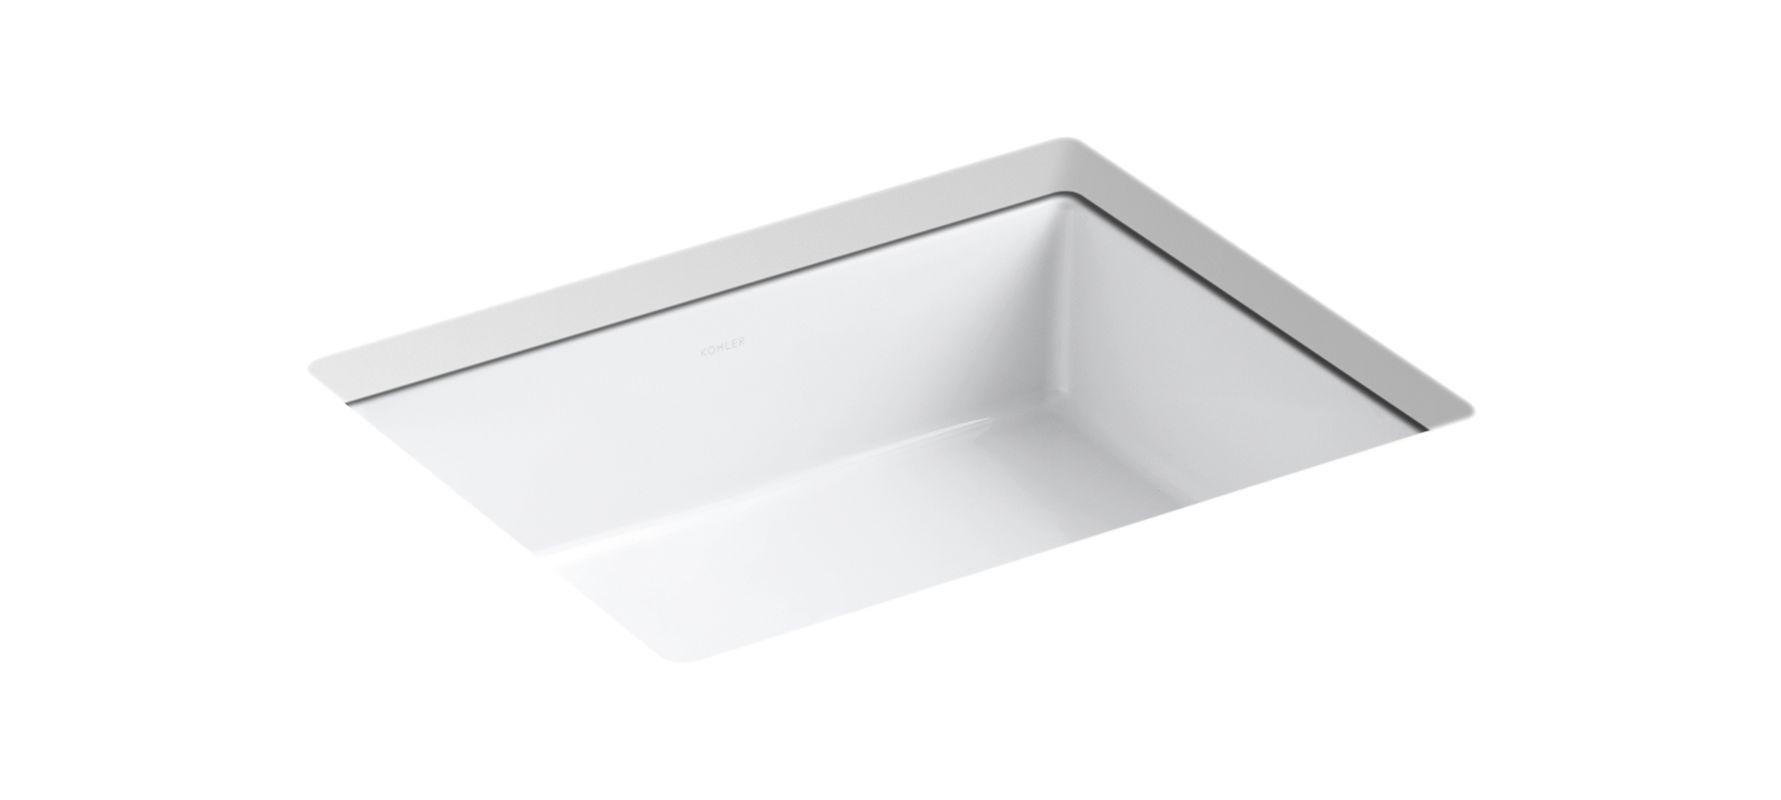 Kohler K 2882 0 White Verticyl 17 1 4 Quot Undermount Bathroom